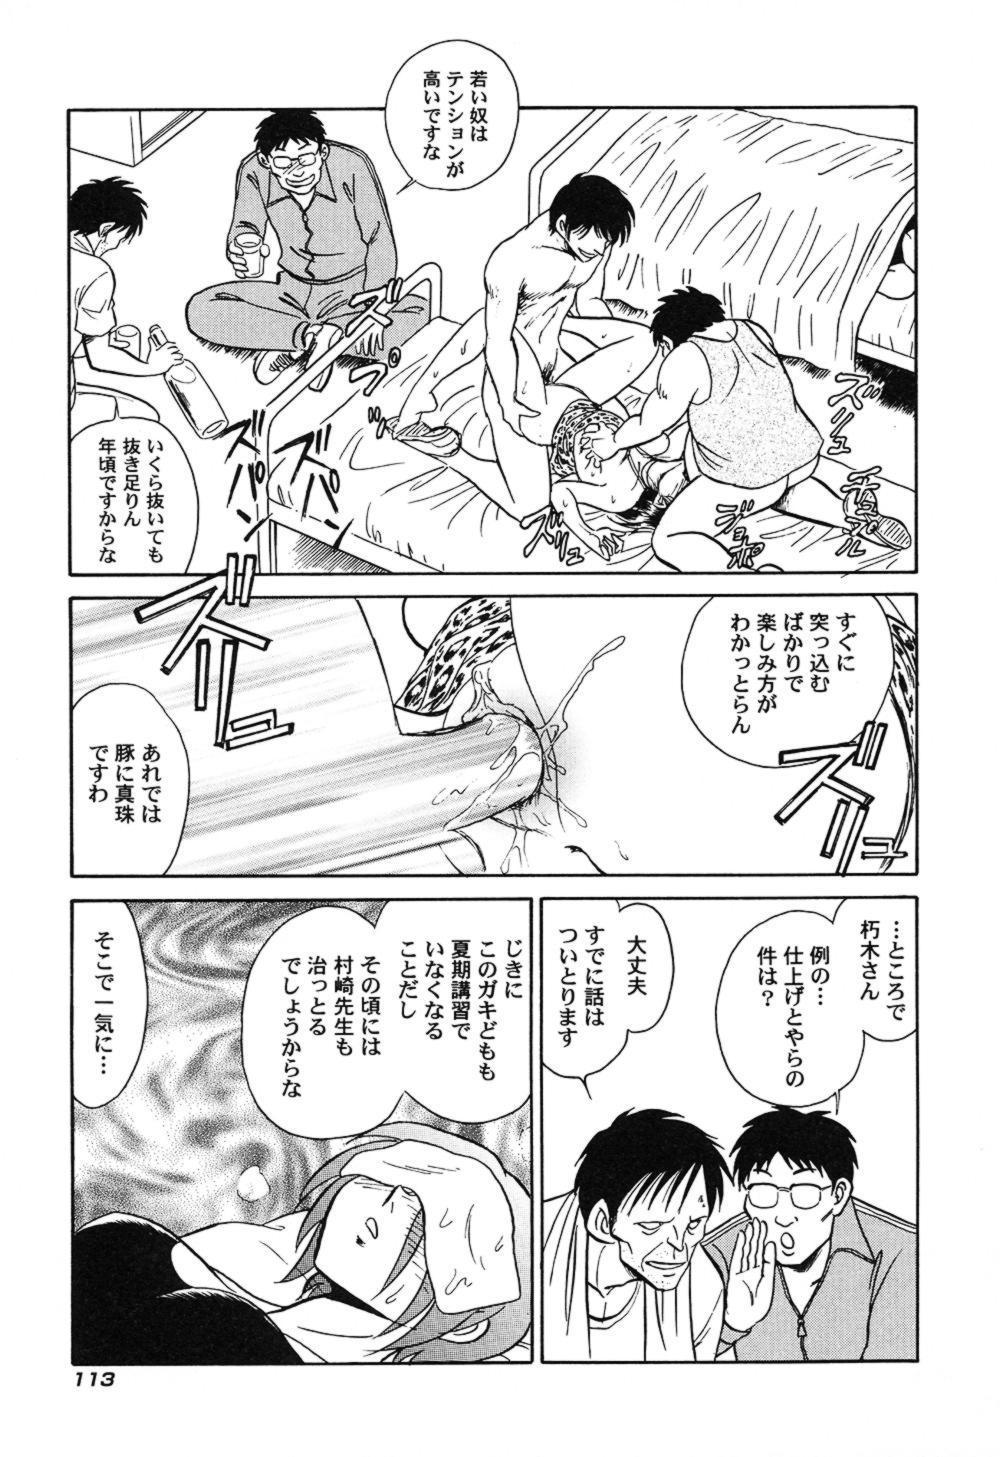 Hageshii Kagai Jugyou 115